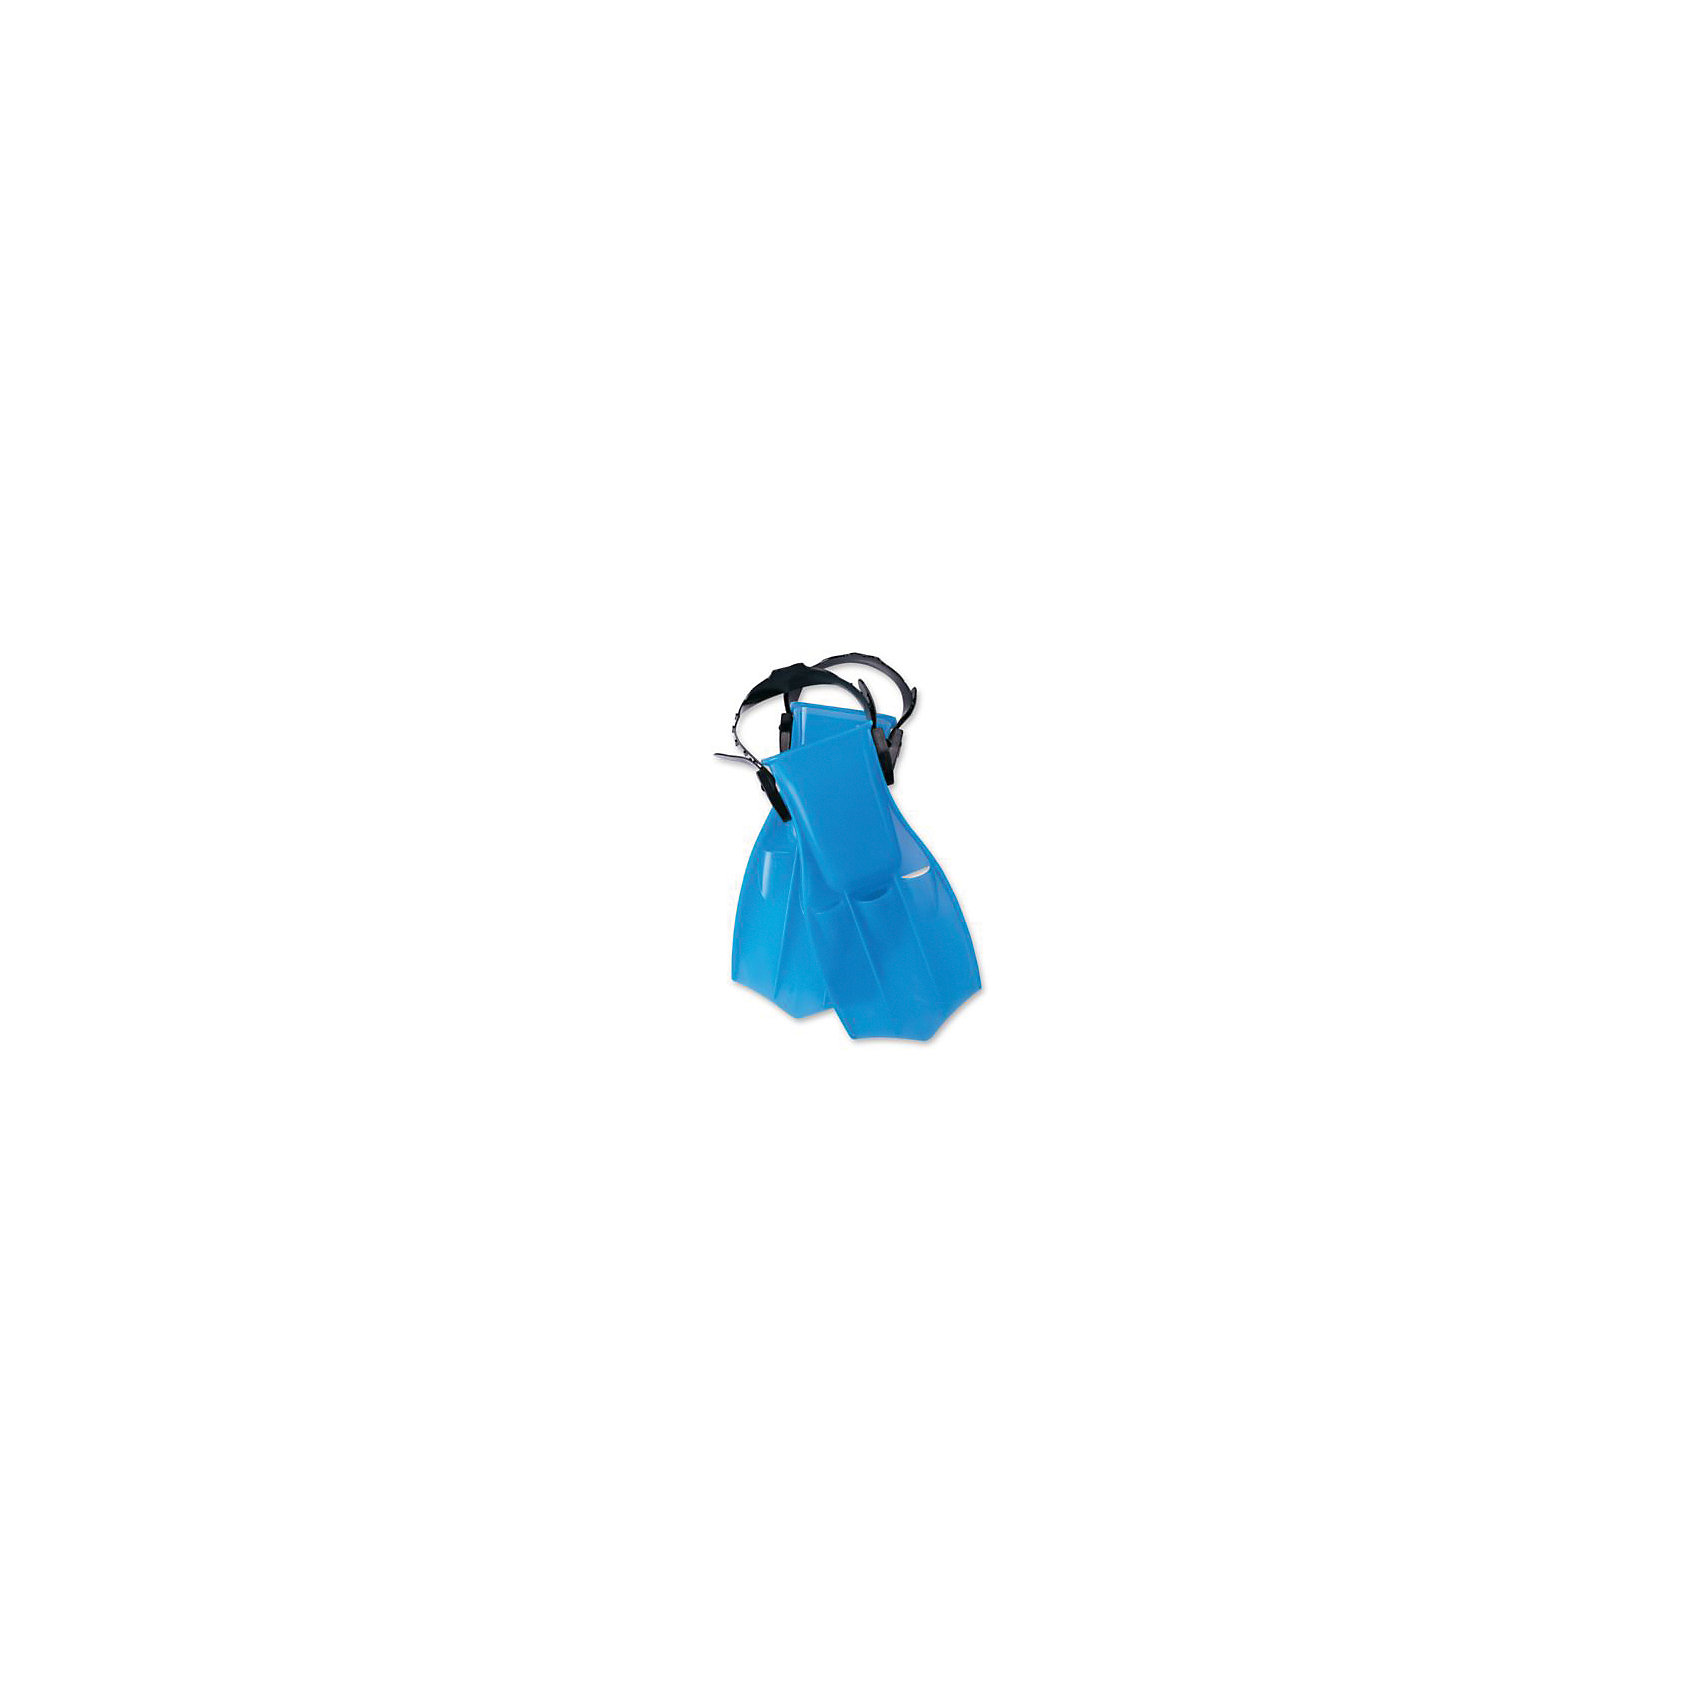 Ласты для плавания Ocean Diver детские, р-р 34-38,  Bestway, голубыеОчки, маски, ласты, шапочки<br><br><br>Ширина мм: 415<br>Глубина мм: 210<br>Высота мм: 79<br>Вес г: 358<br>Возраст от месяцев: 36<br>Возраст до месяцев: 72<br>Пол: Унисекс<br>Возраст: Детский<br>SKU: 5613185